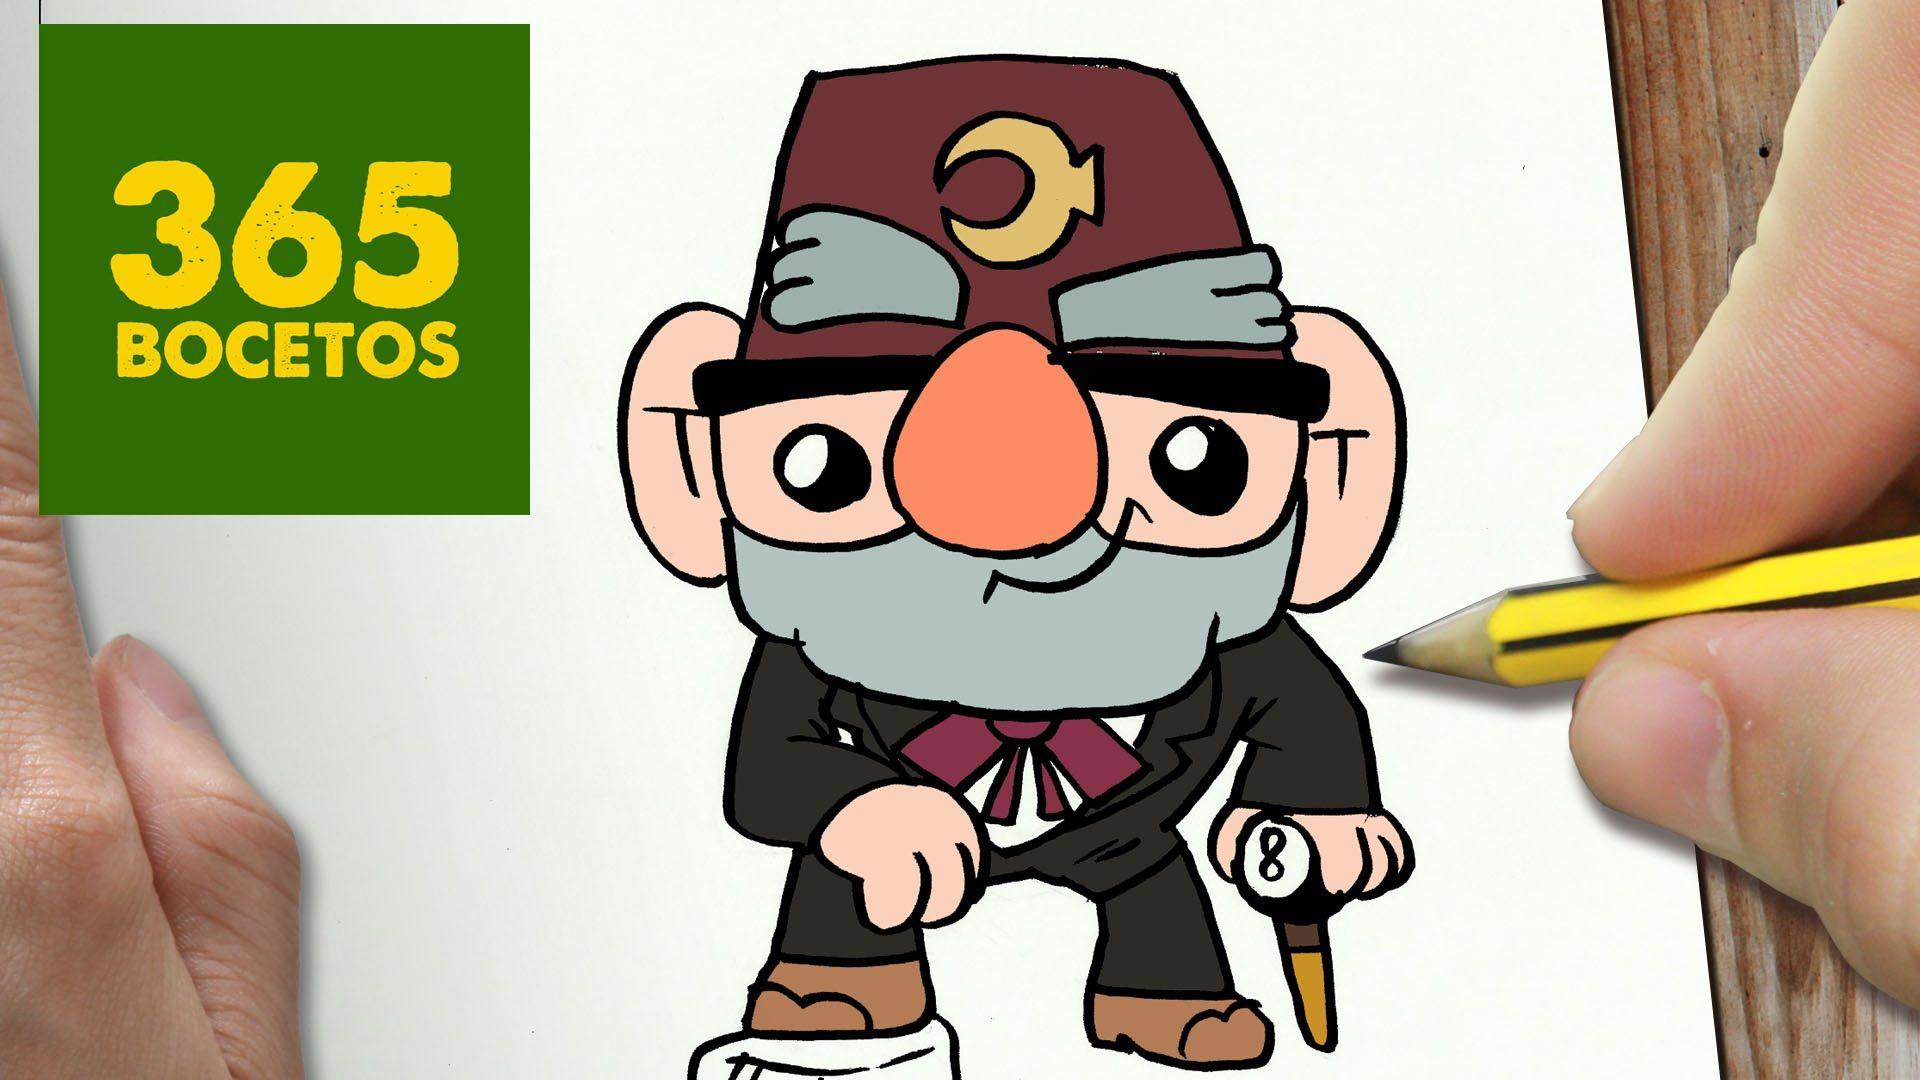 COMO DIBUJAR TIO STAN DE GRAVITY FALLS KAWAII PASO A PASO - Dibujos Kawa...